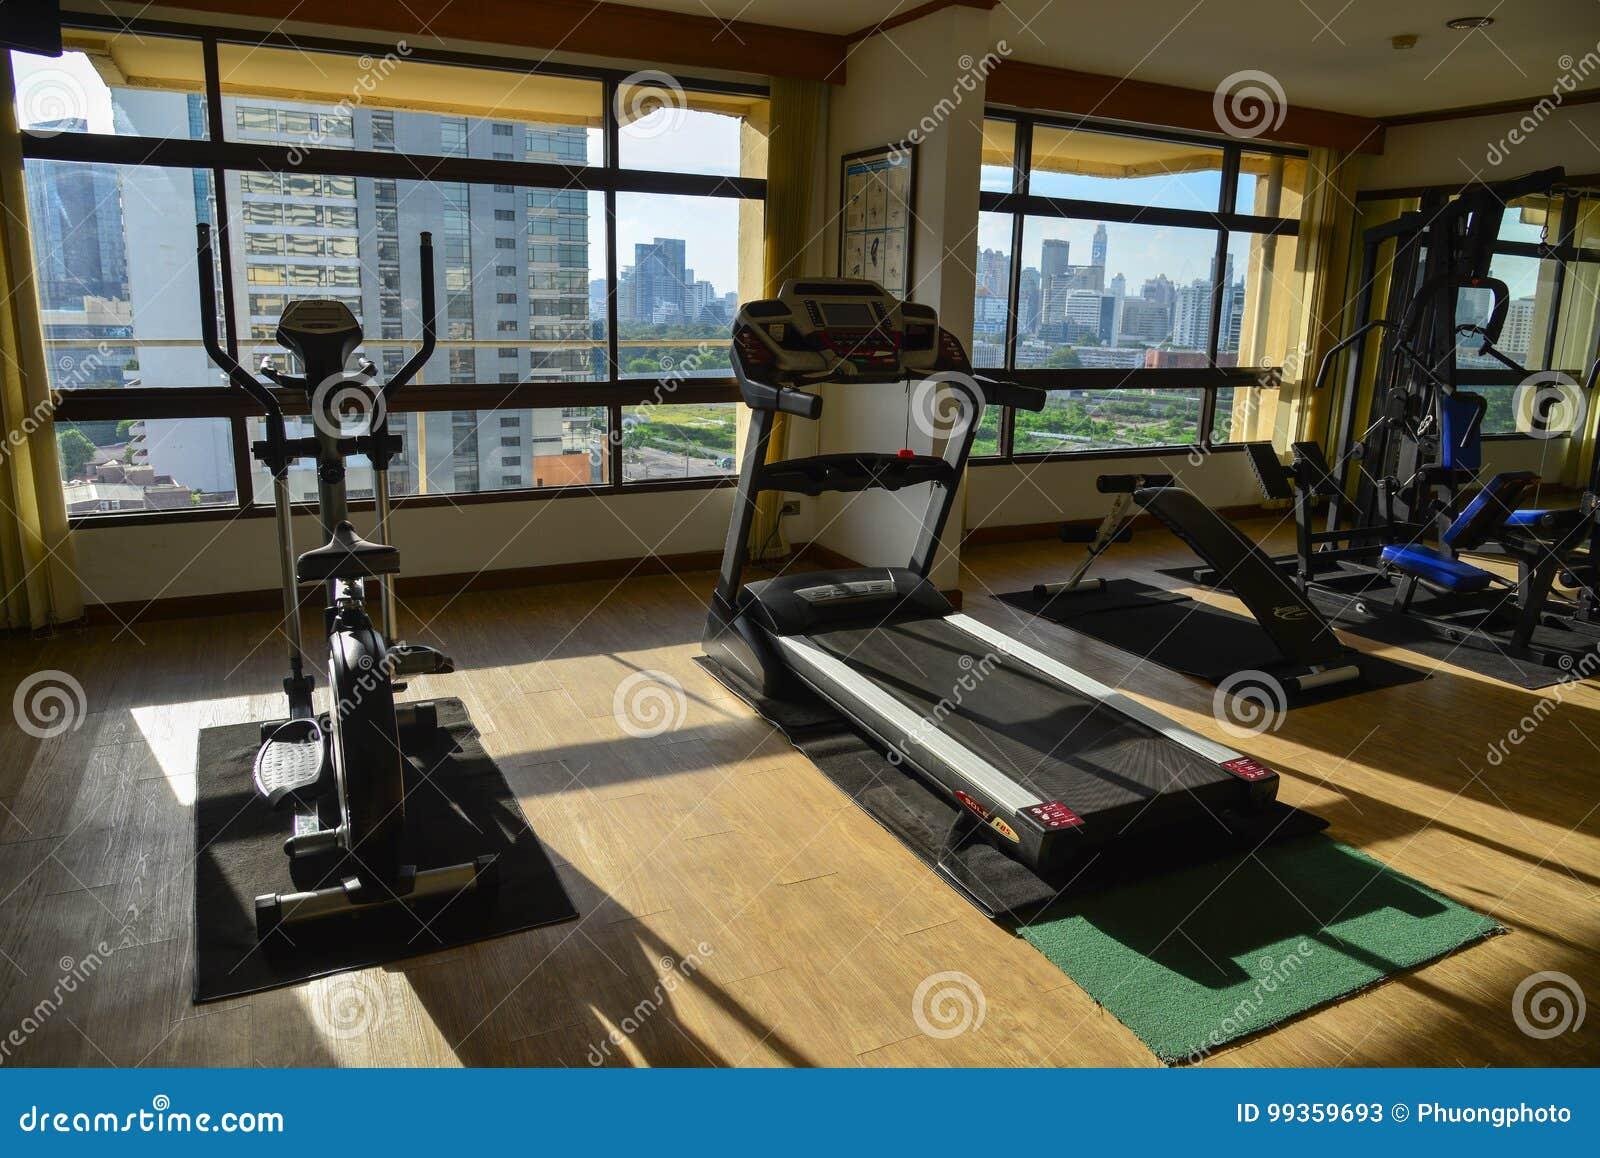 Superb Interior Of Gym Room At A Luxury Hotel Editorial Stock Photo Interior Design Ideas Skatsoteloinfo